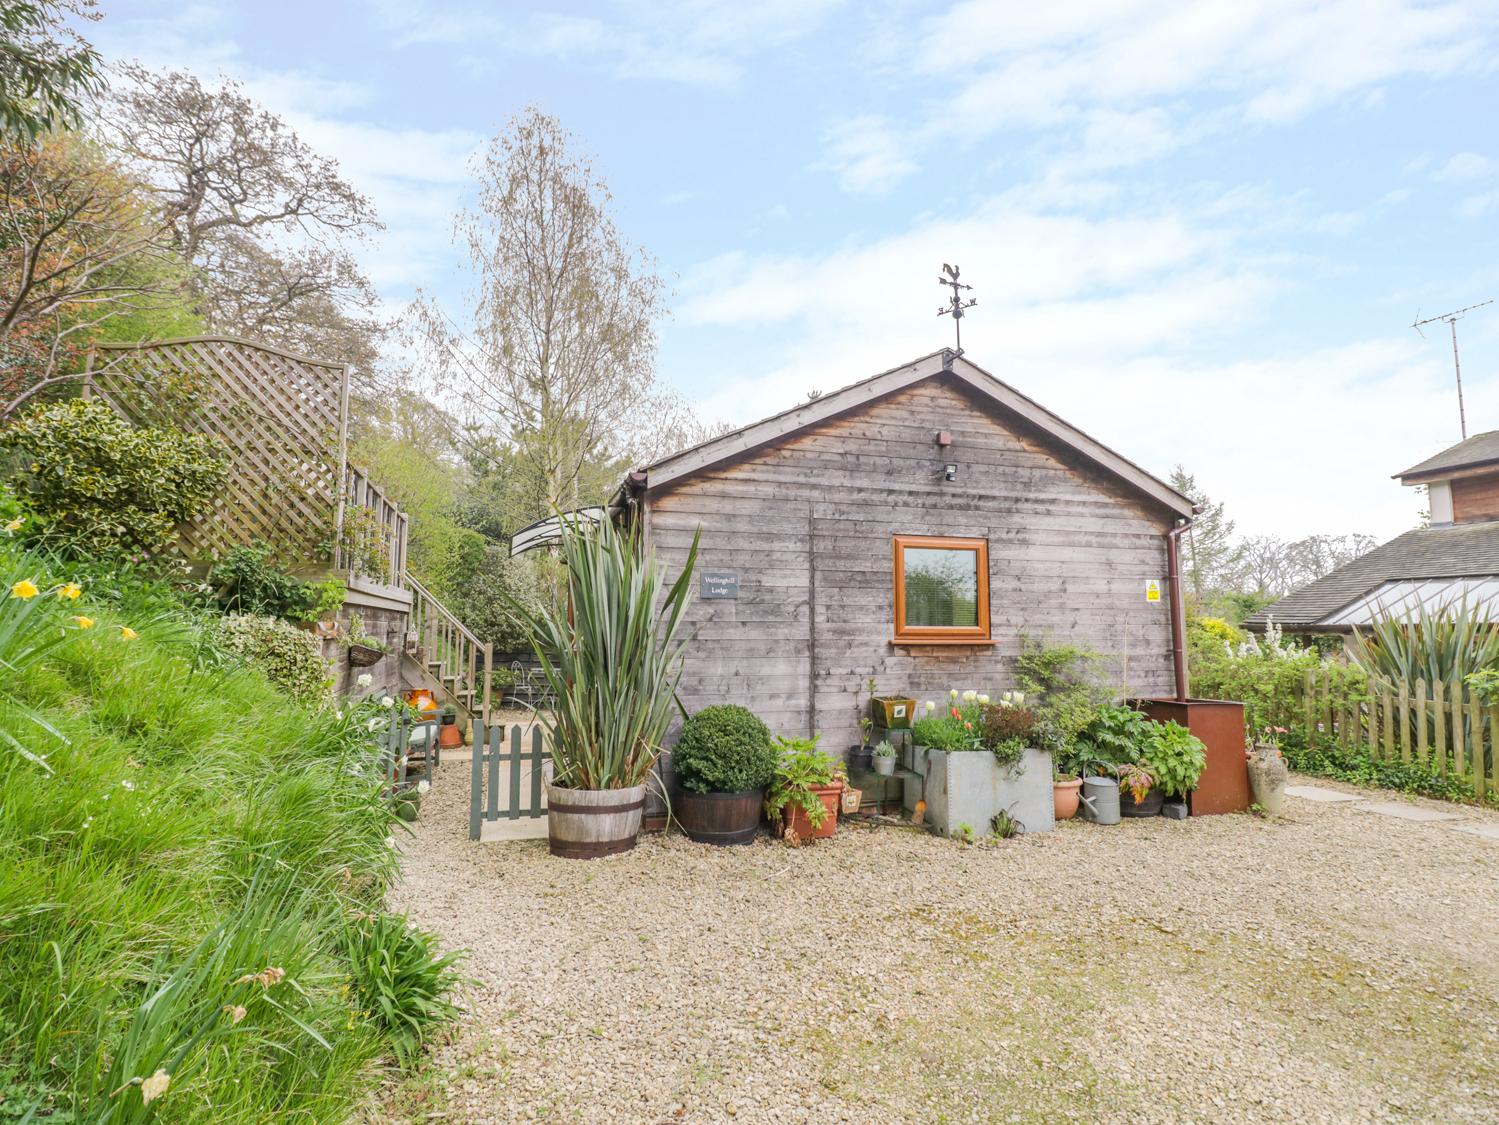 1 bedroom Cottage for rent in Cheltenham